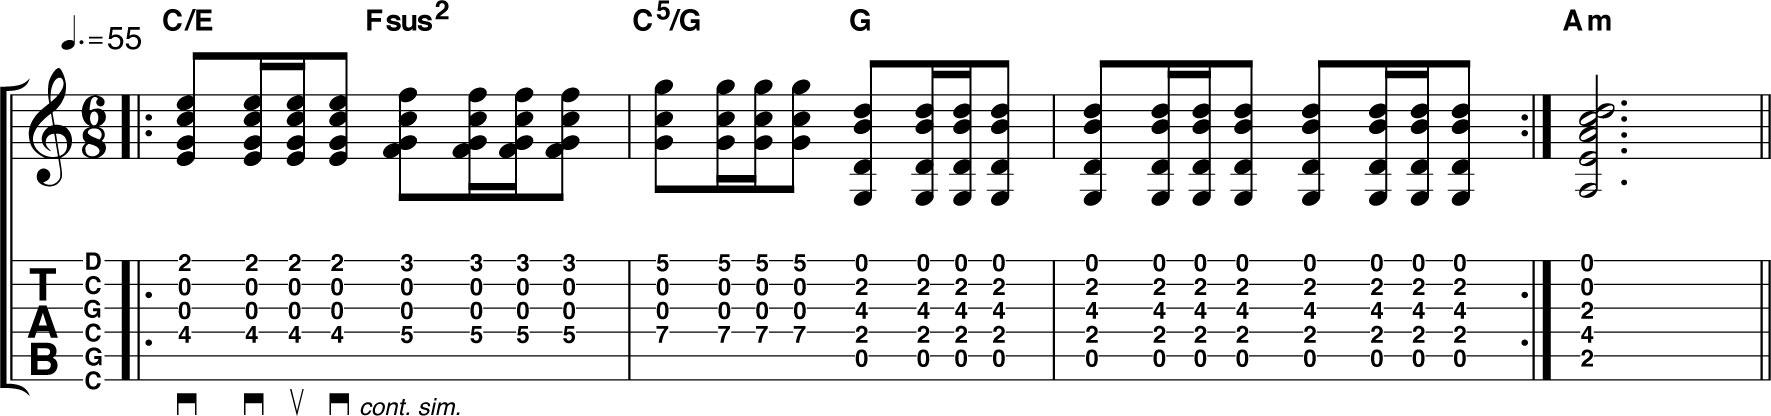 cgcgcd-tuning-tab